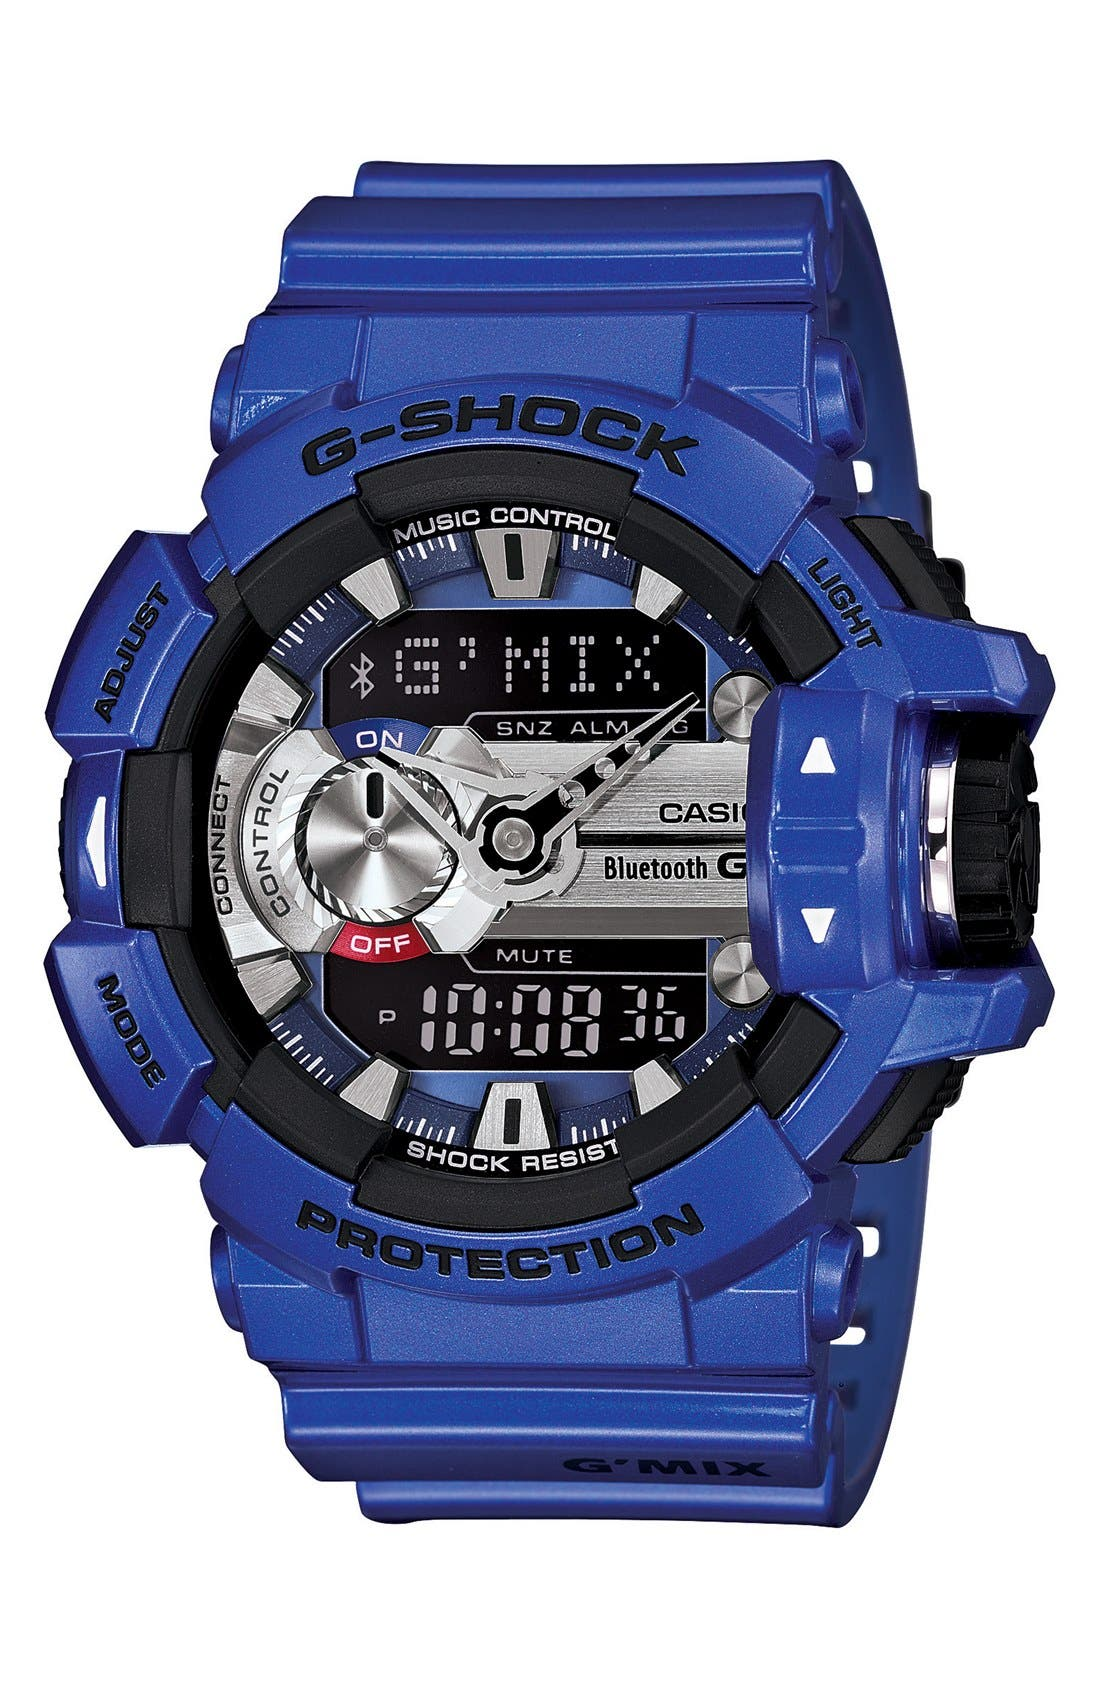 GShock Bluetooth Enabled Watch 55Mm X 52Mm